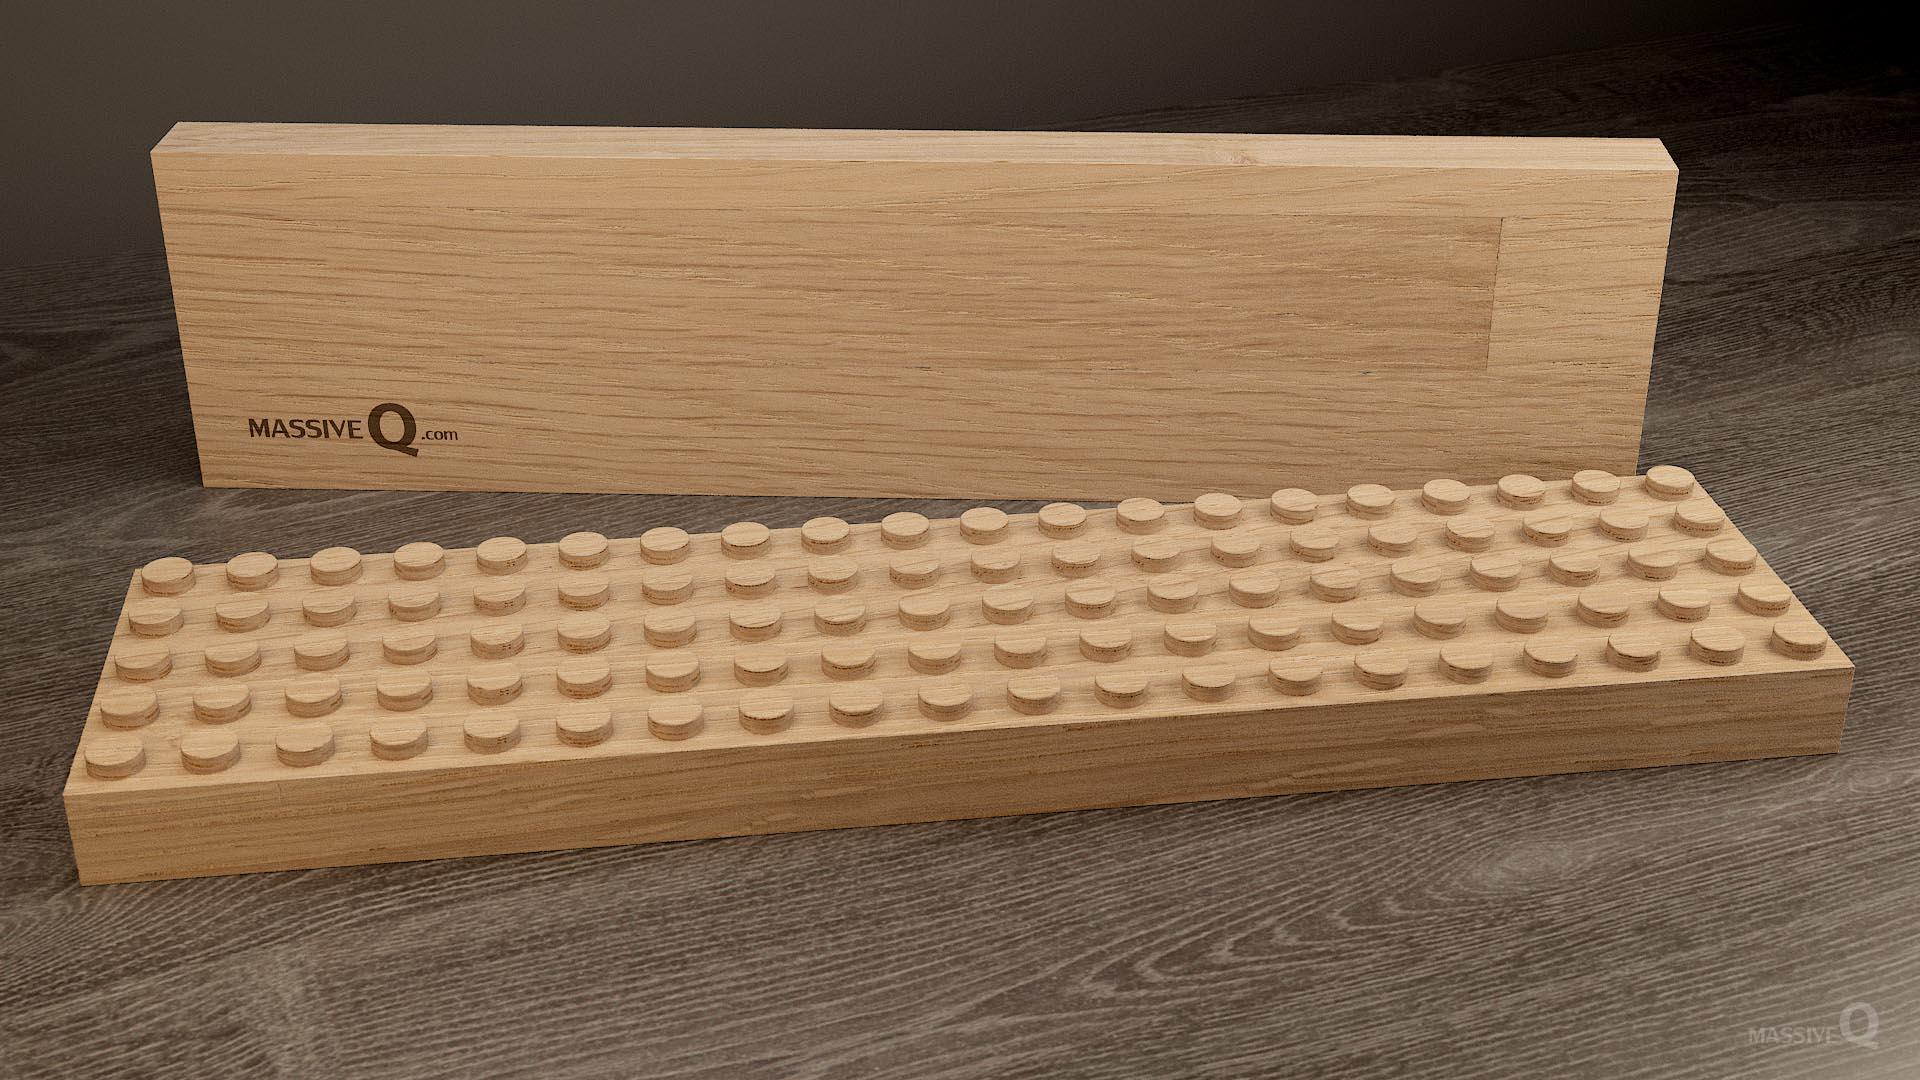 Q Baseplate 5x20x3 – Oak